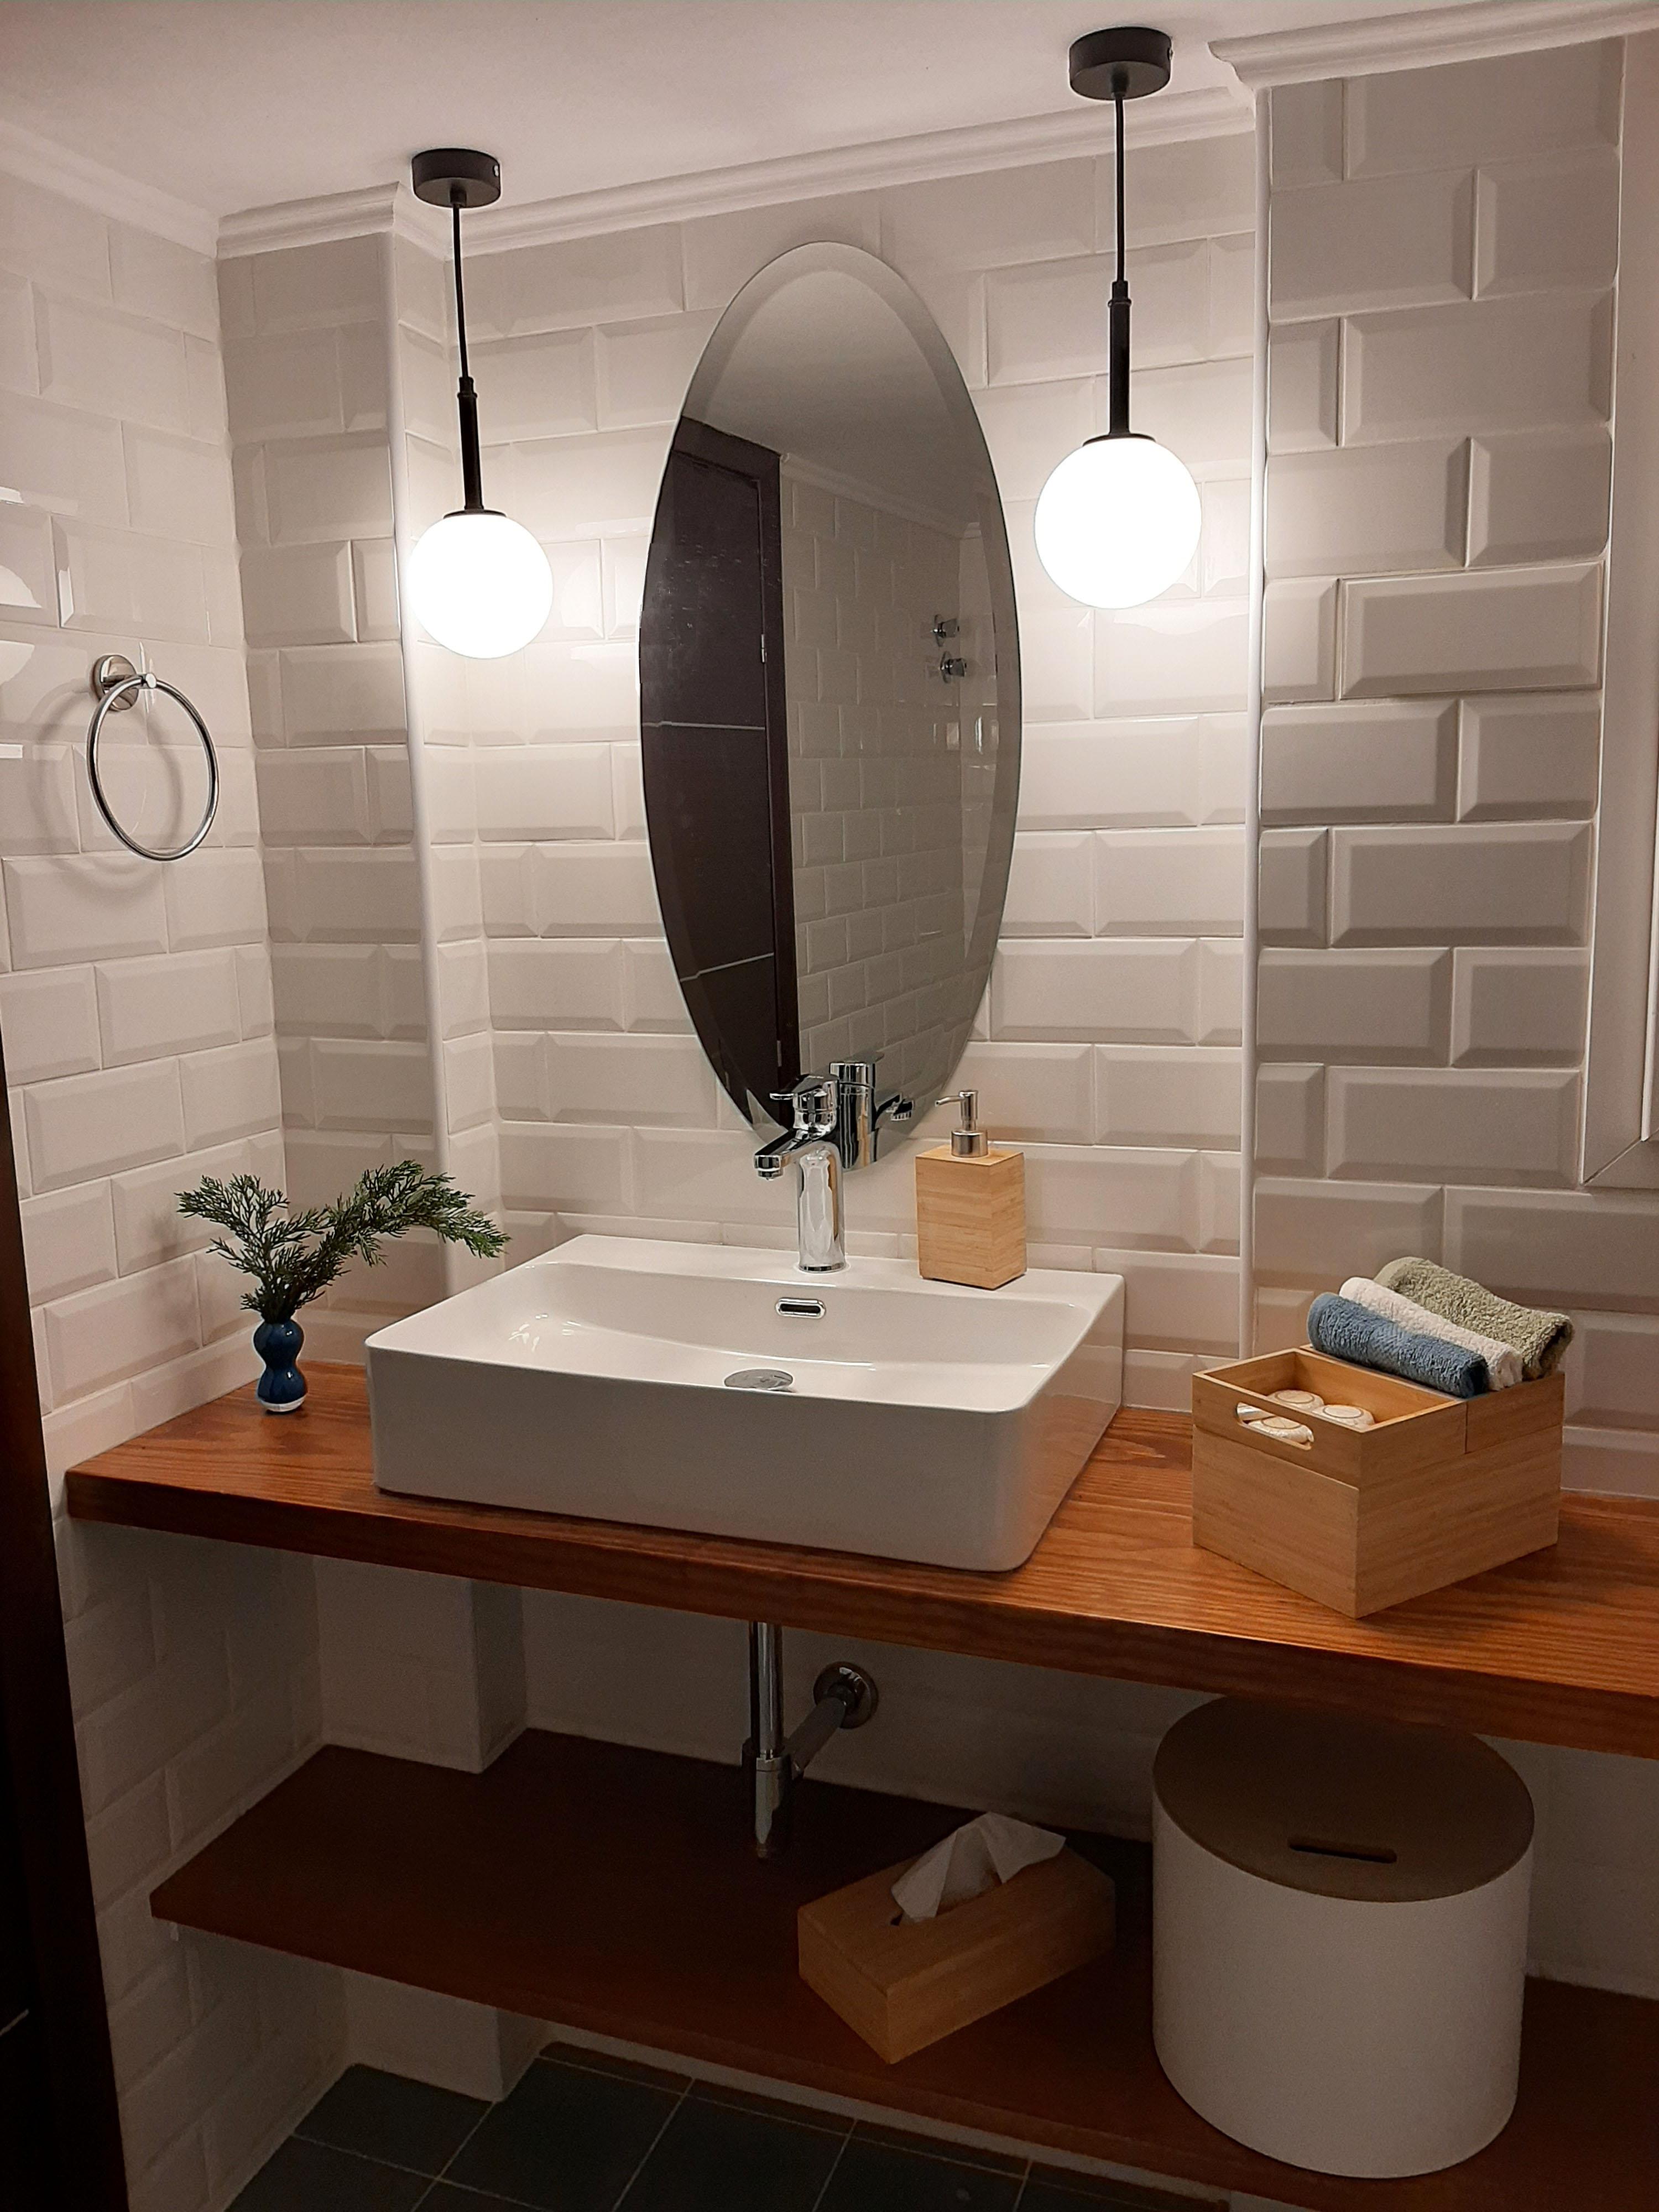 2 WC 20210108